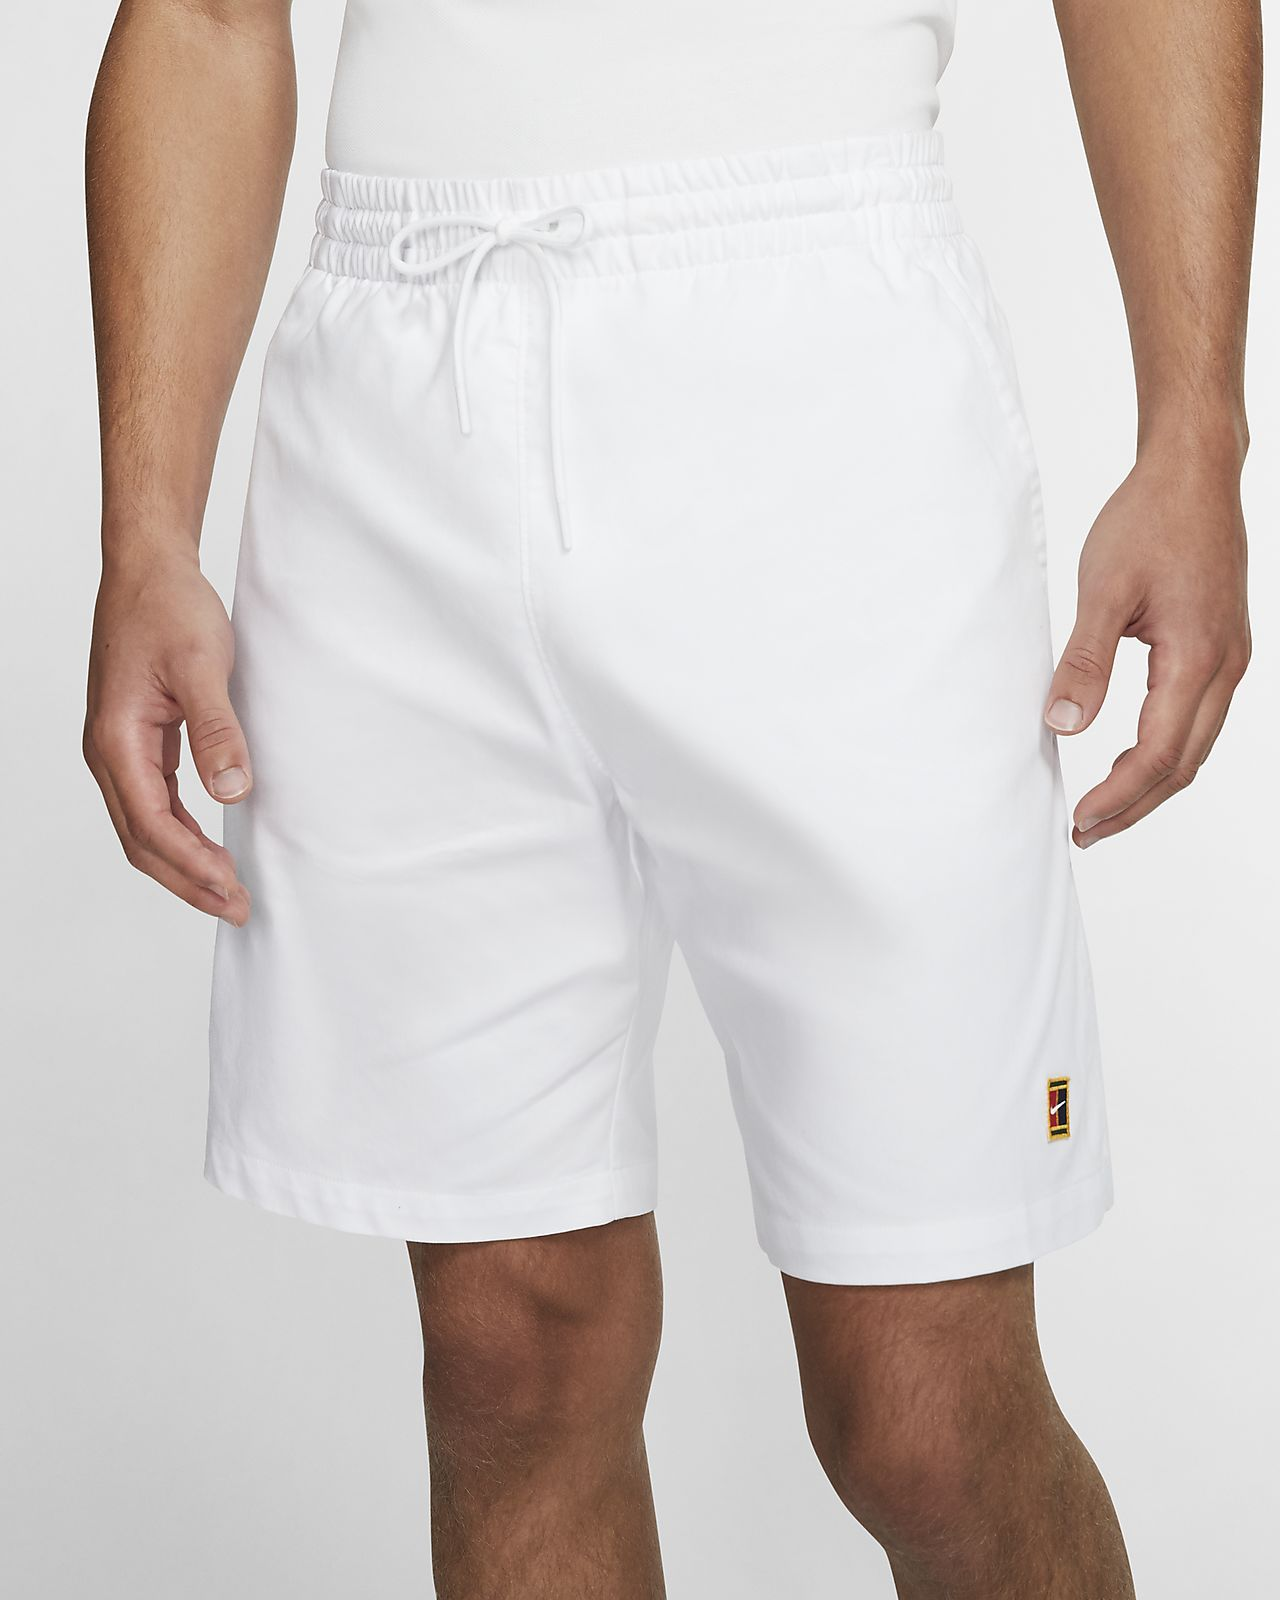 Shorts de tenis para hombre NikeCourt